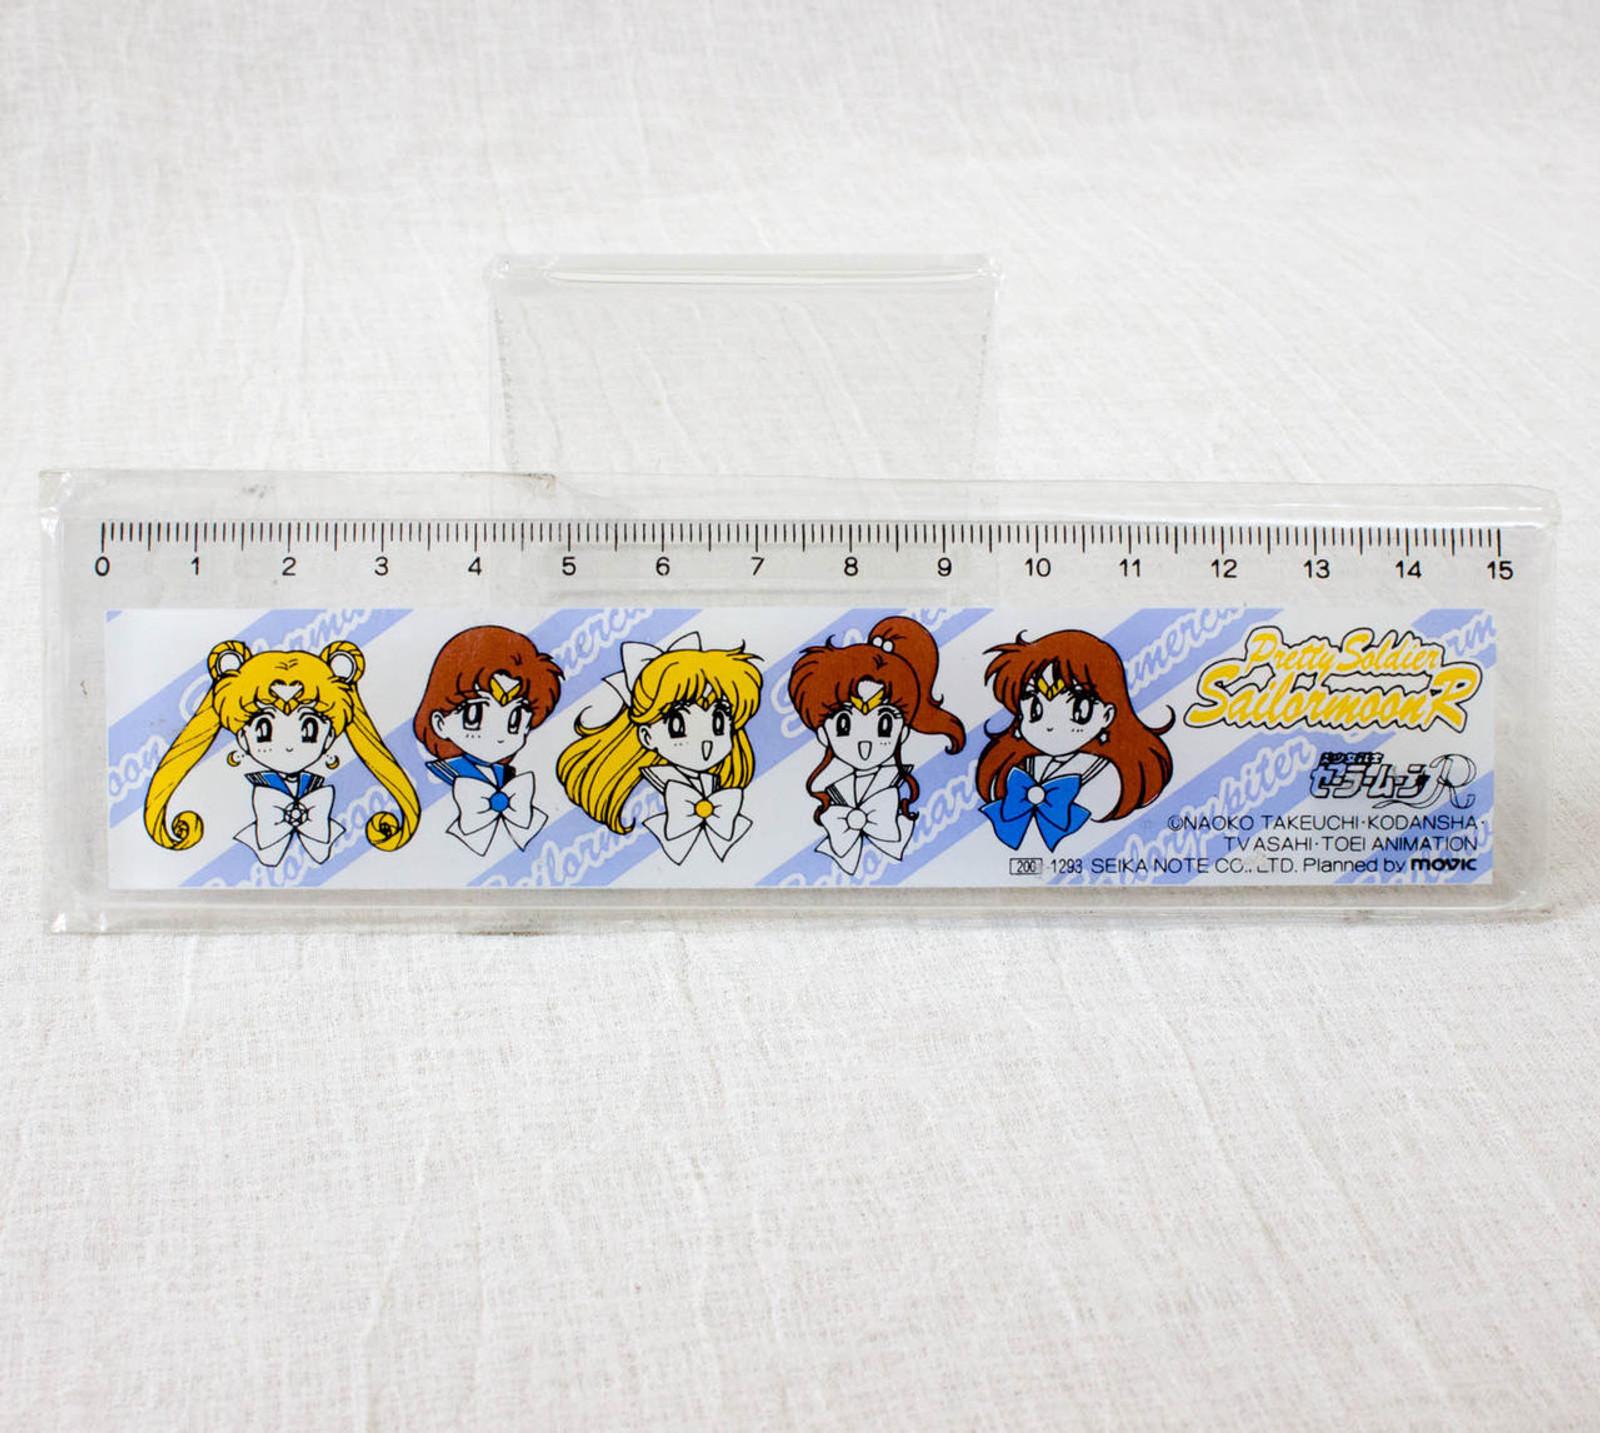 Retro RARE! Sailor Moon R Ruler 15cm SEIKA NOTE JAPAN ANIME MANGA